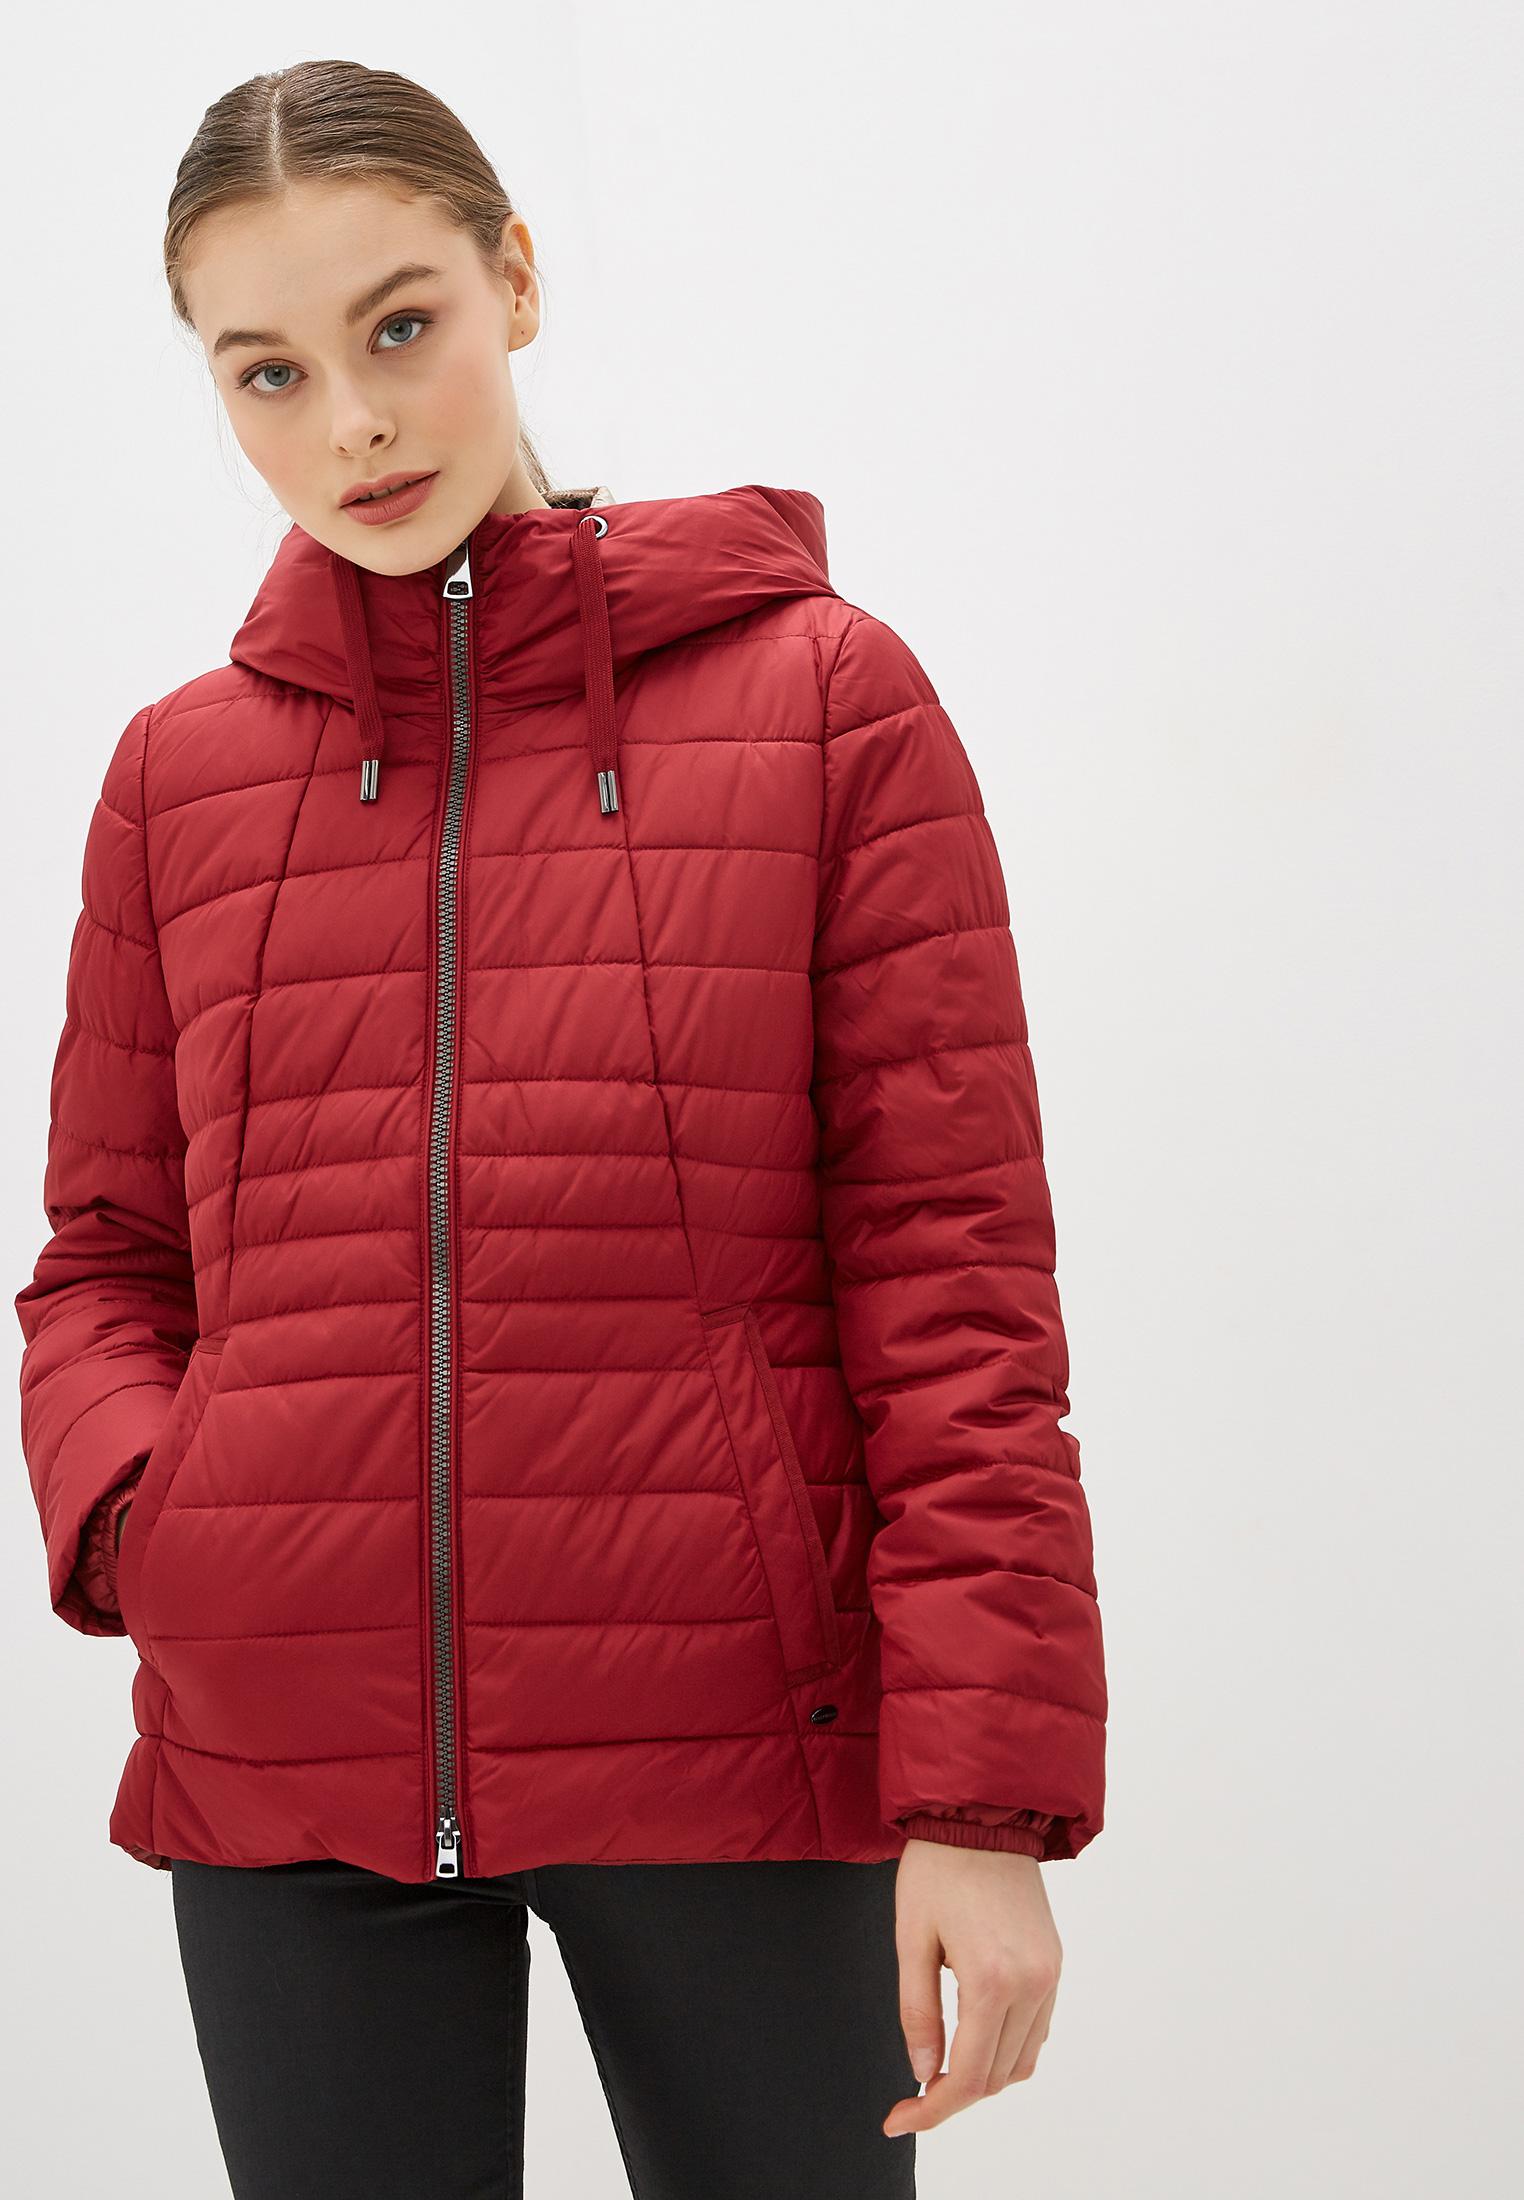 Утепленная куртка Gerry Weber (Гарри Вебер) 250235-31088